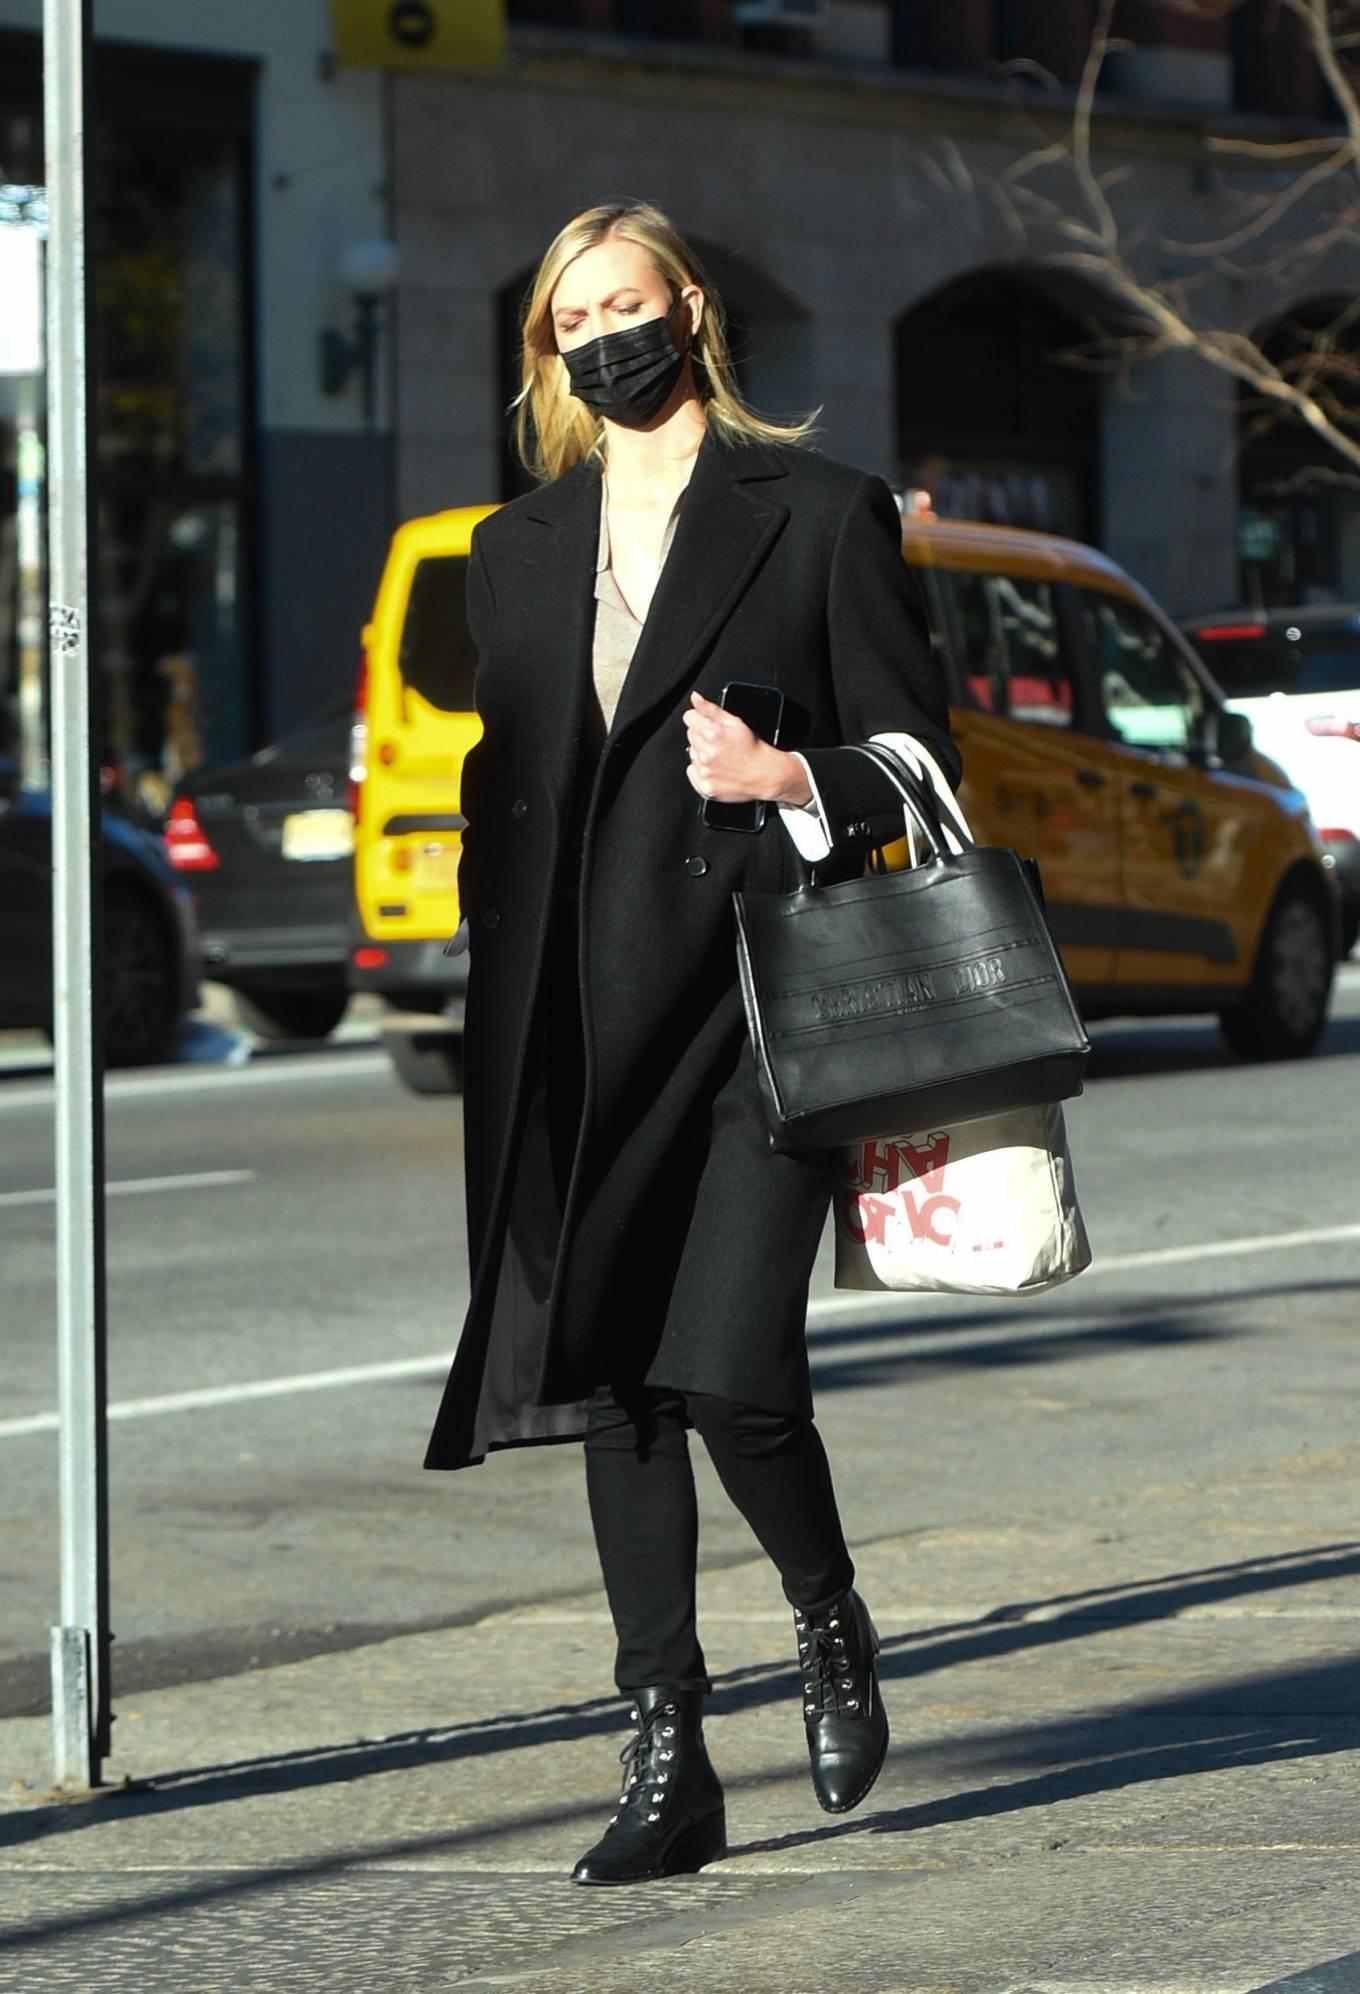 Karlie Kloss carrying a brand logo Dior calfskin tote